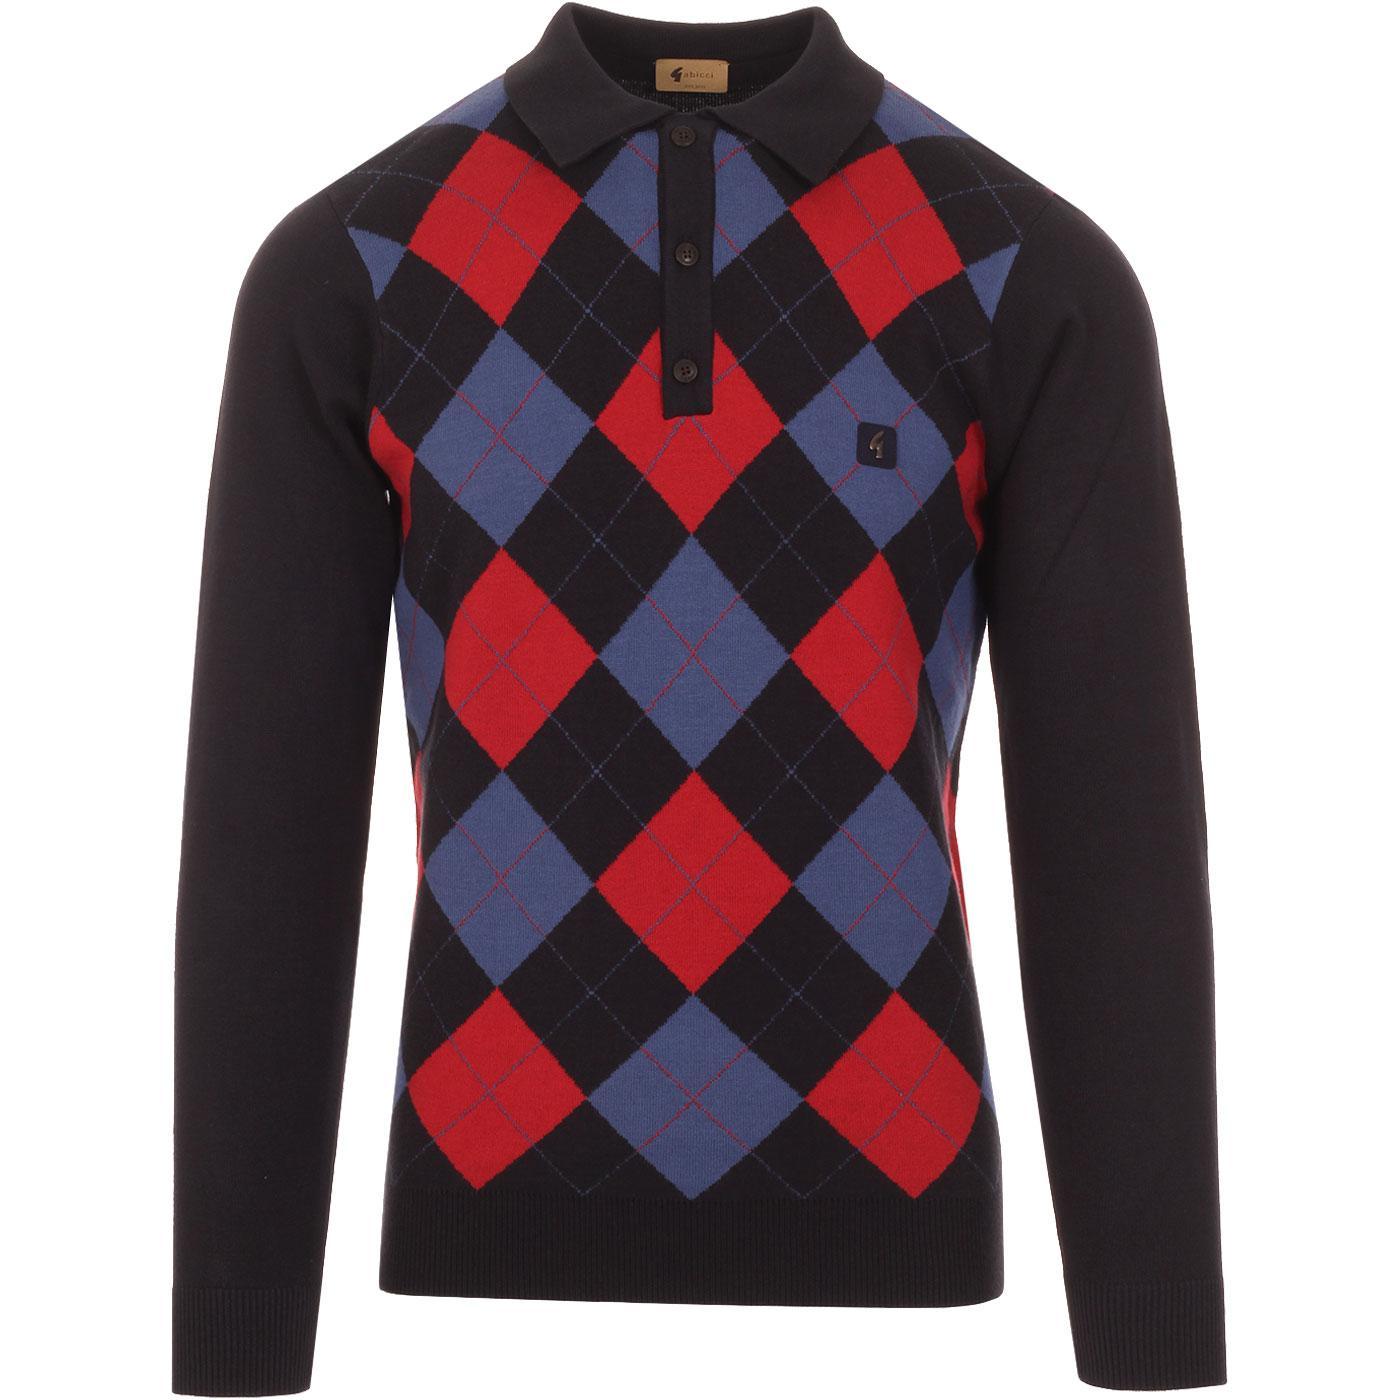 Putter GABICCI VINTAGE Mod Argyle Knitted Polo N